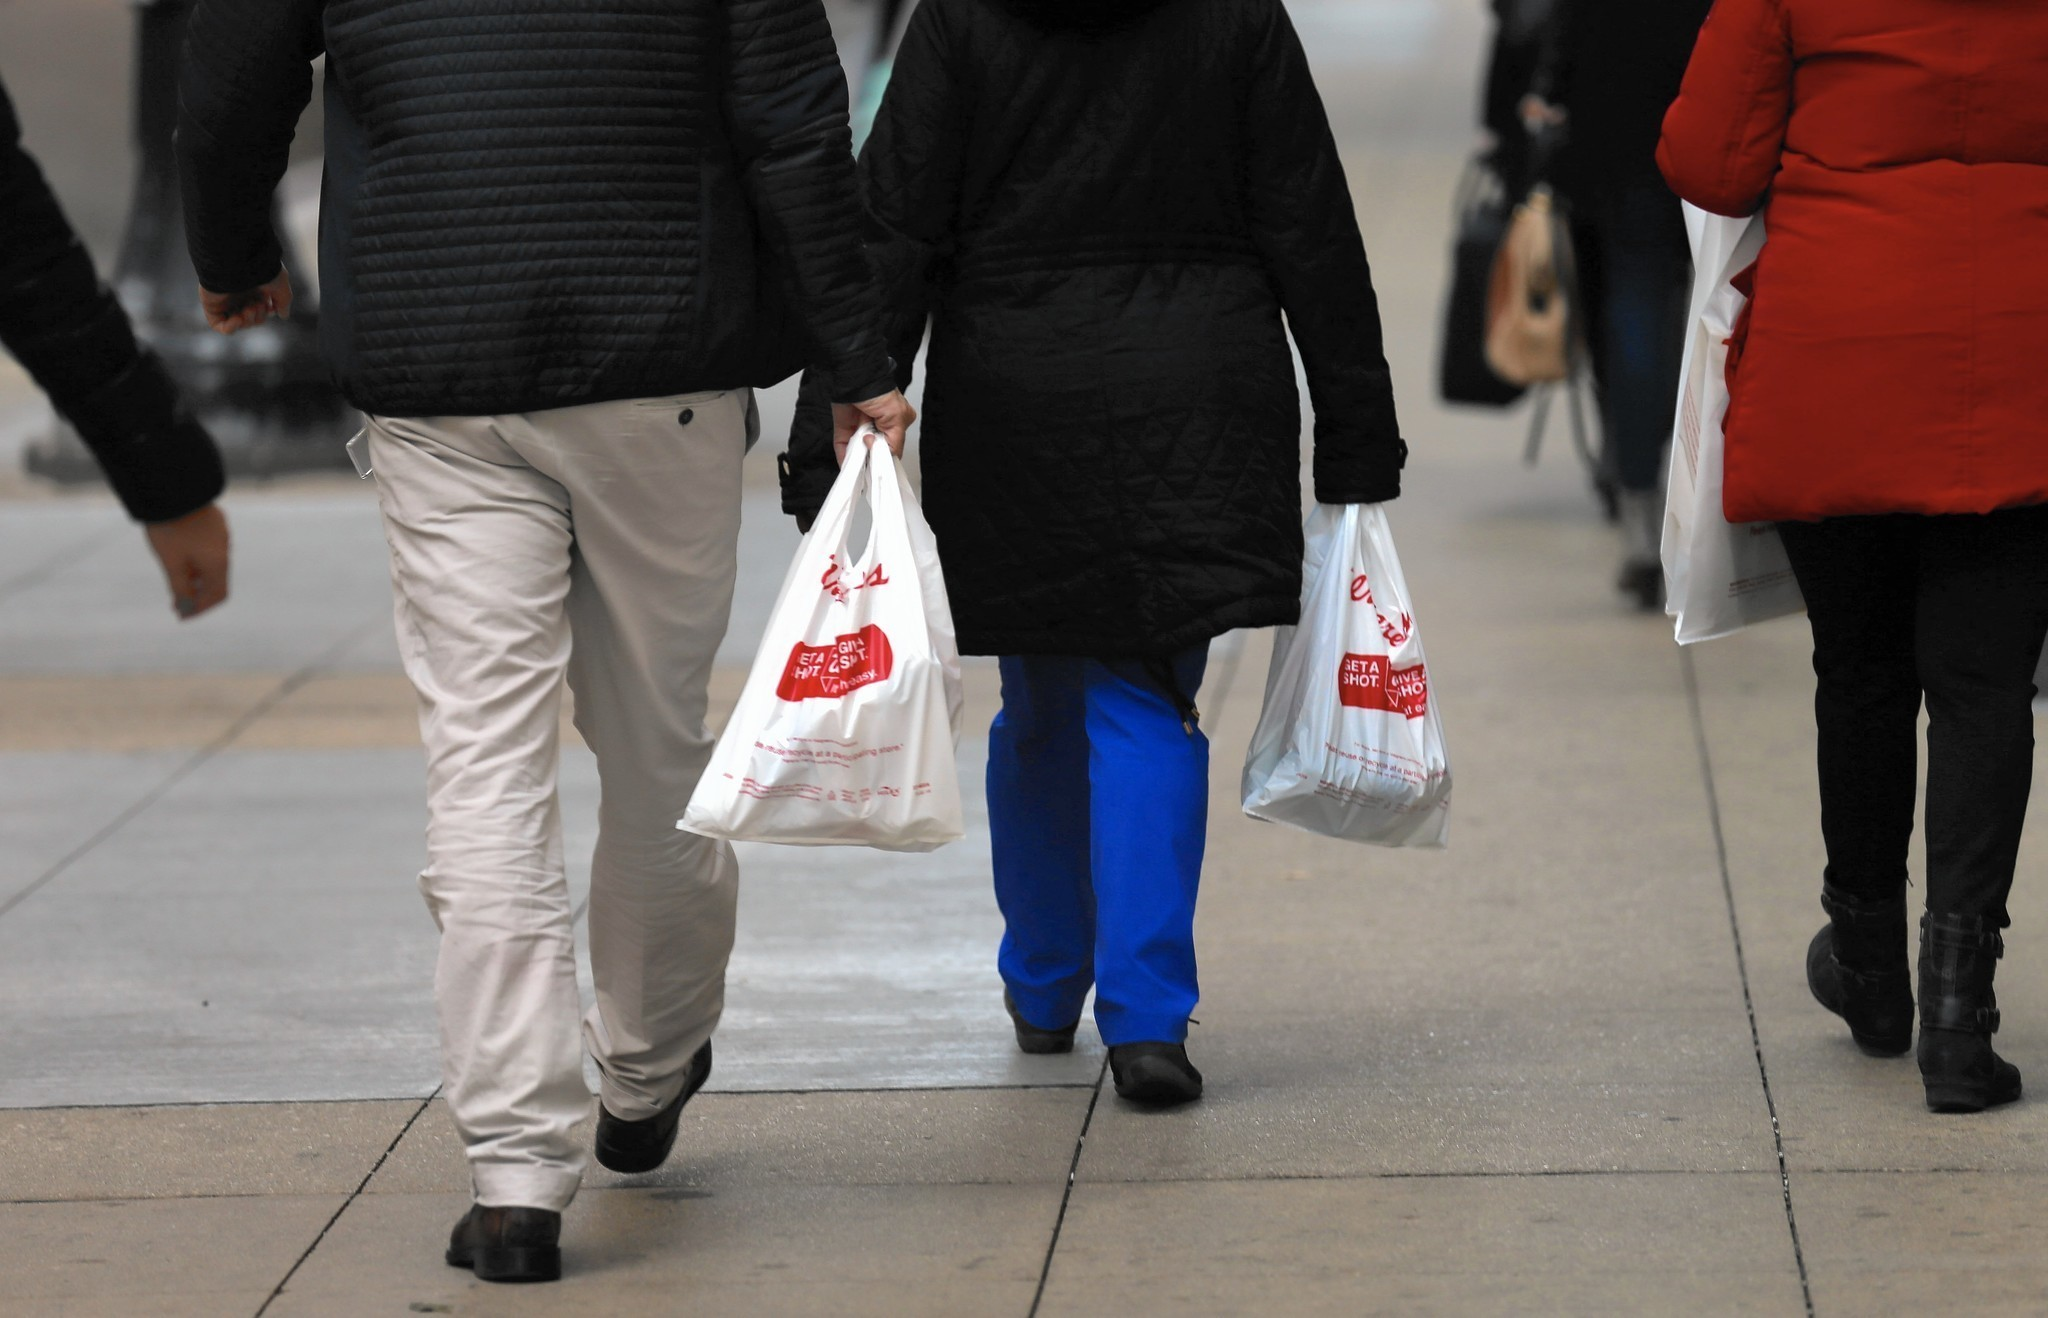 Plastic bag ban chicago - Plastic Bag Ban Chicago 48